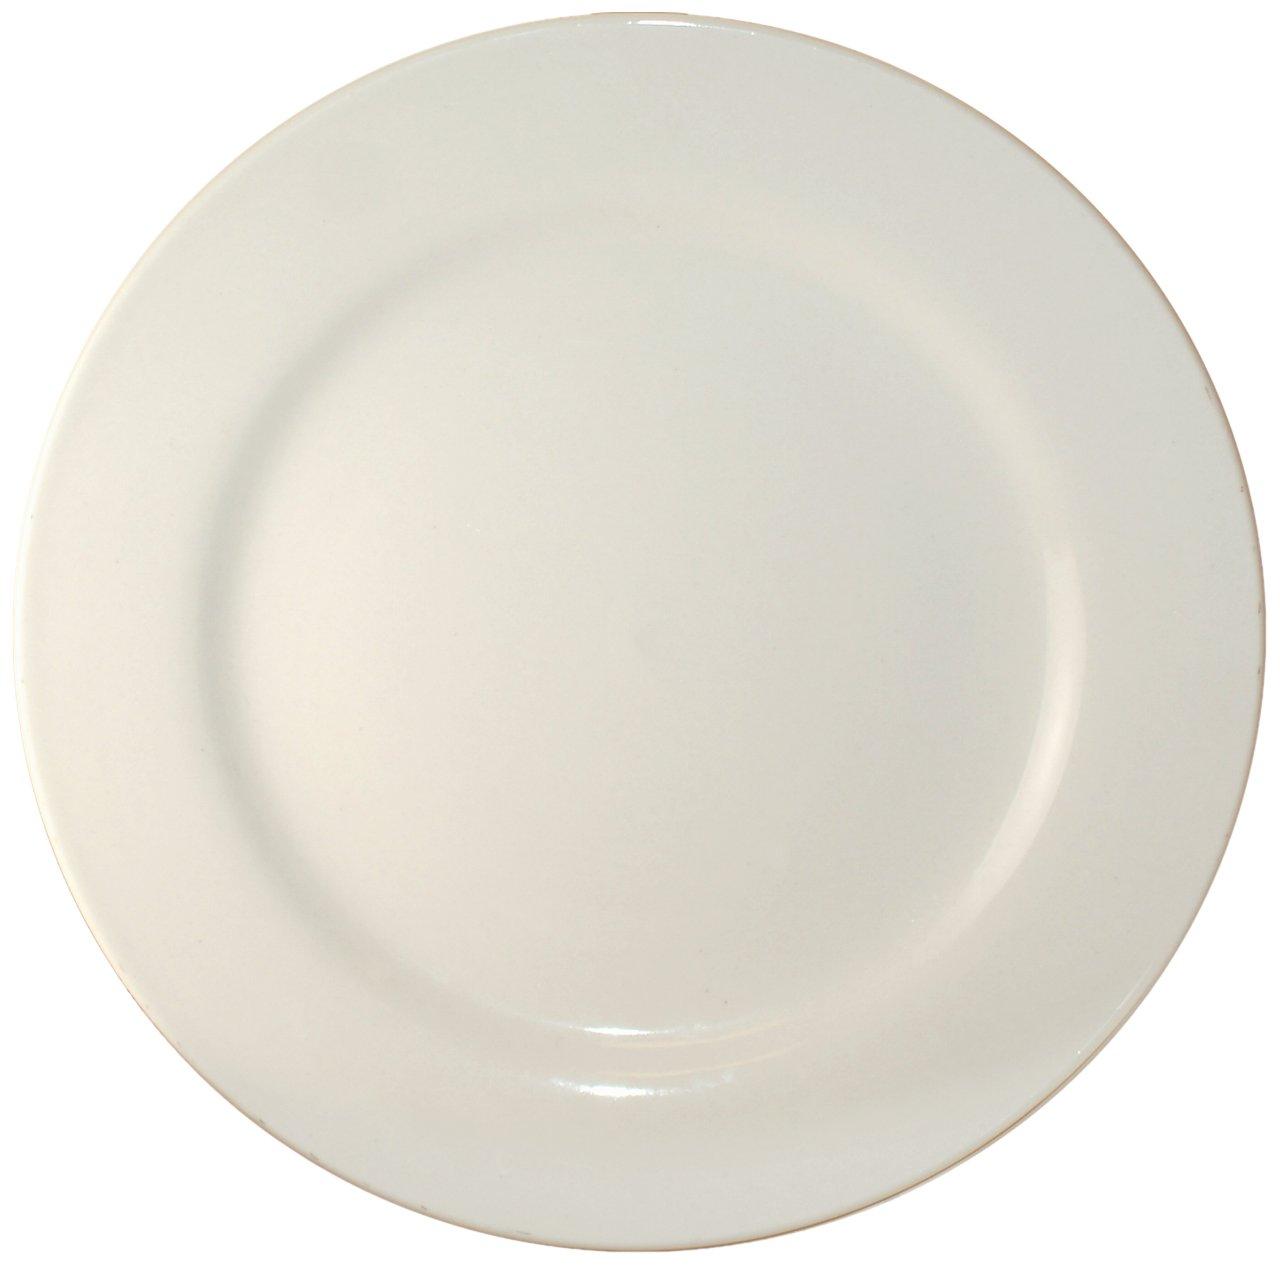 ITI-RO-21 Roma 12-Inch Plate, 12-Piece, American White by ITI